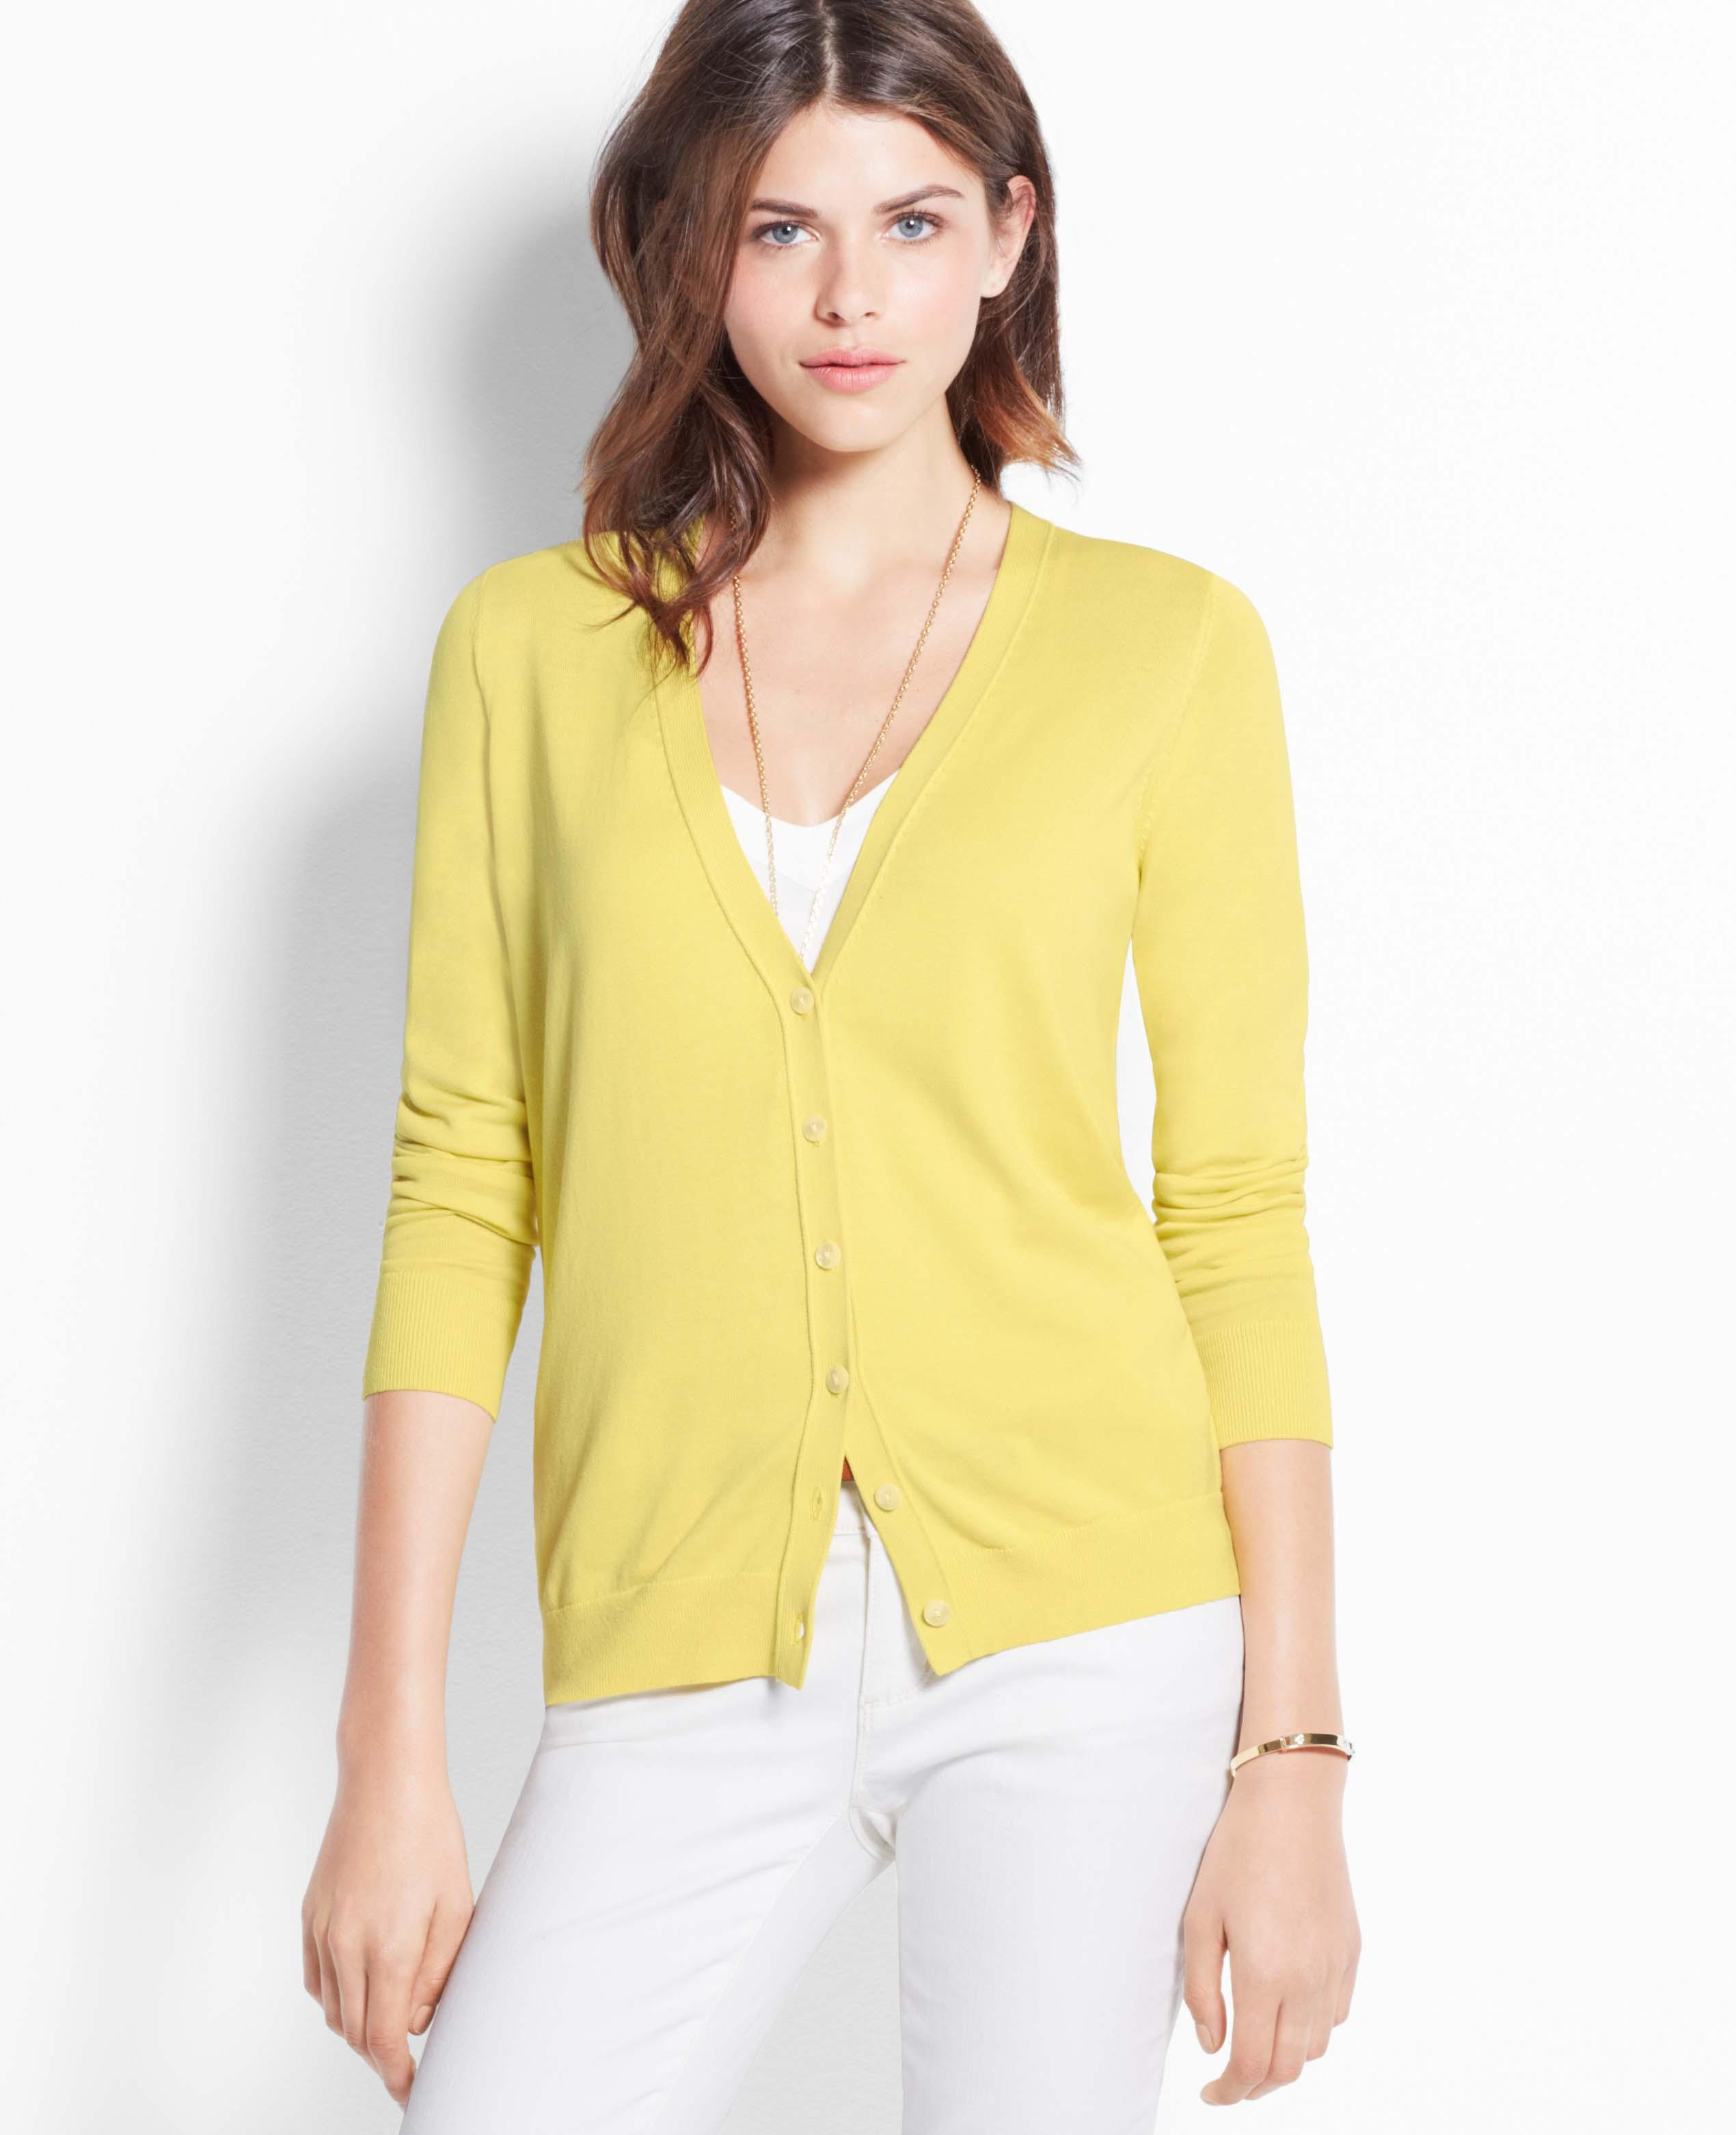 Ann taylor Petite Silk Cotton Cardigan in Yellow | Lyst